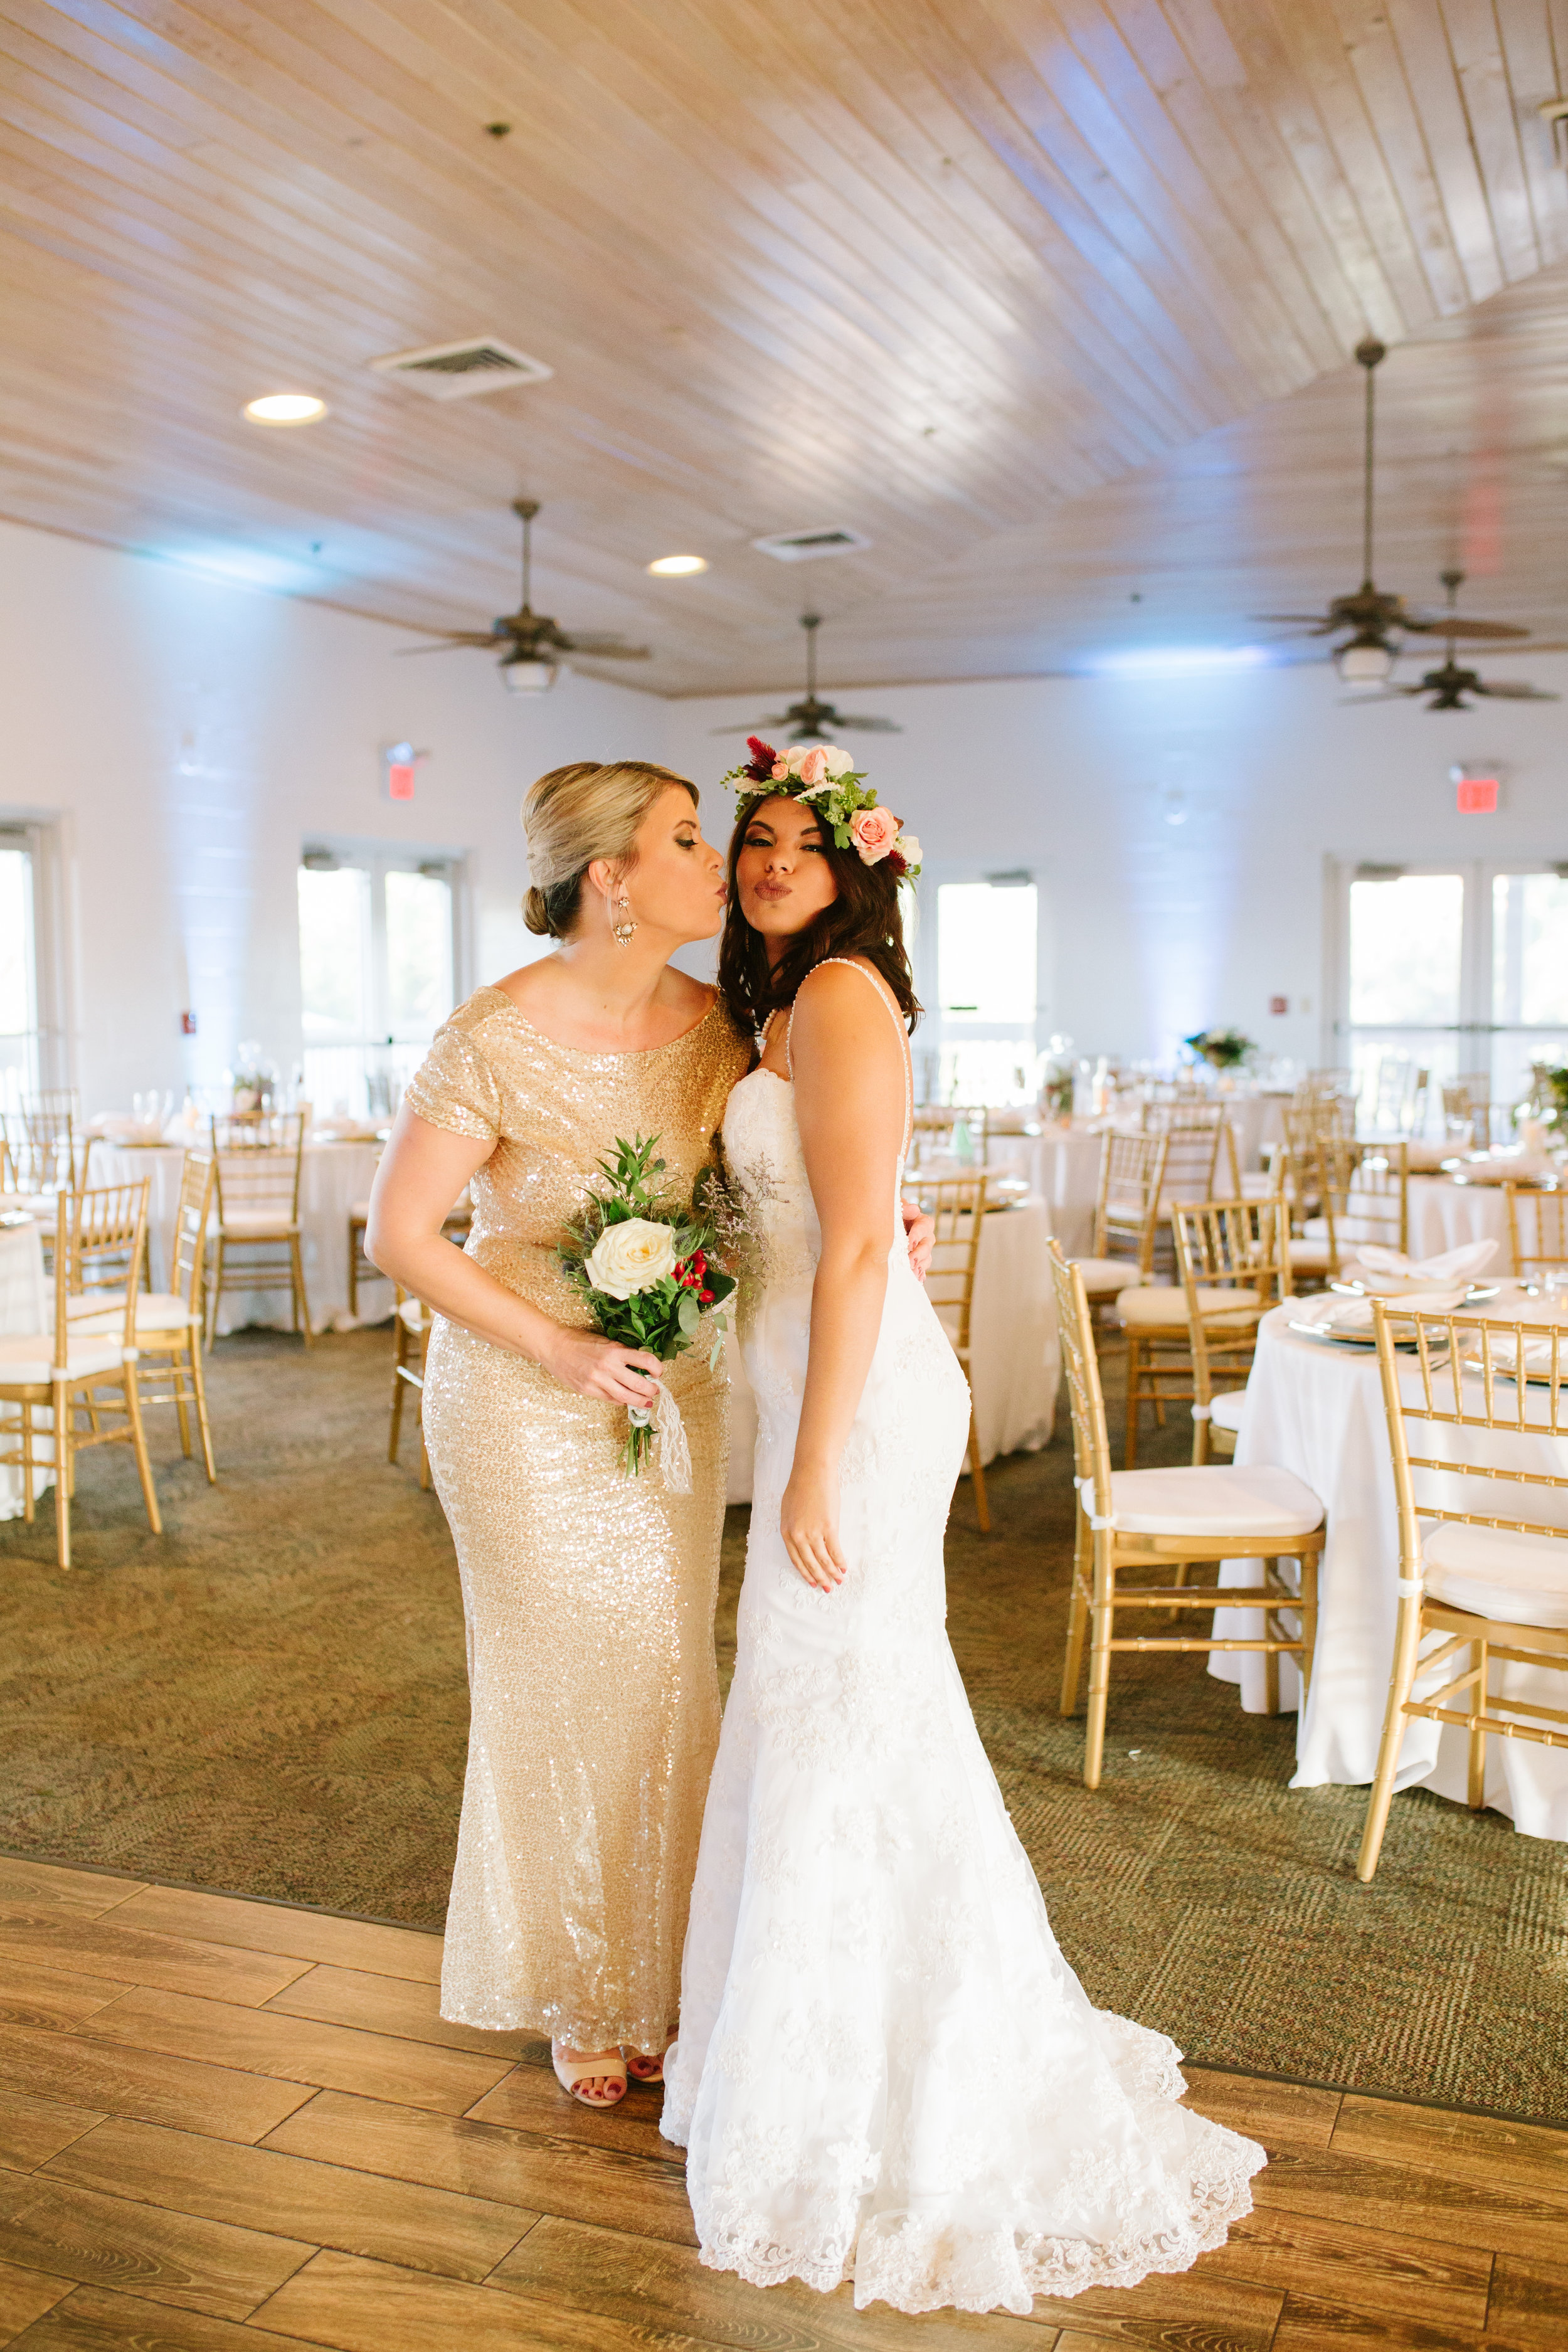 2017.05.23 Barbara and Mauricio Sales Port St Lucie Wedding (251 of 772).jpg